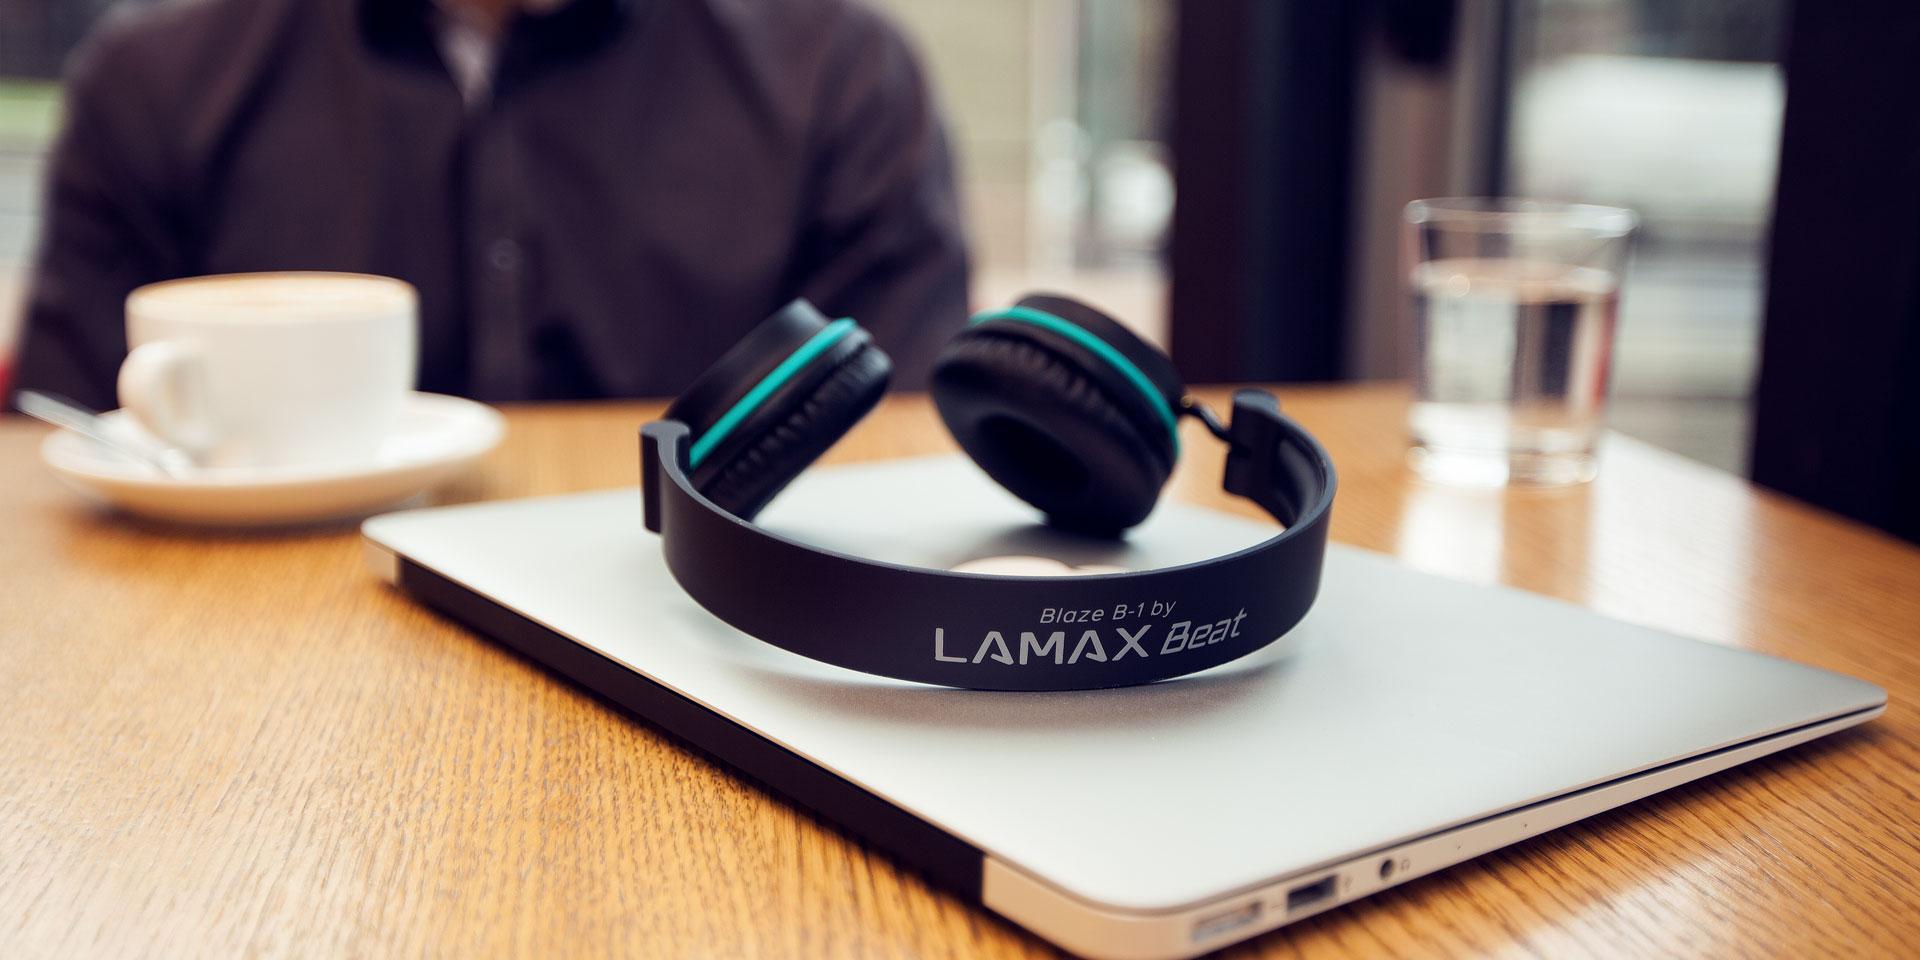 Lamax Blaze B-1